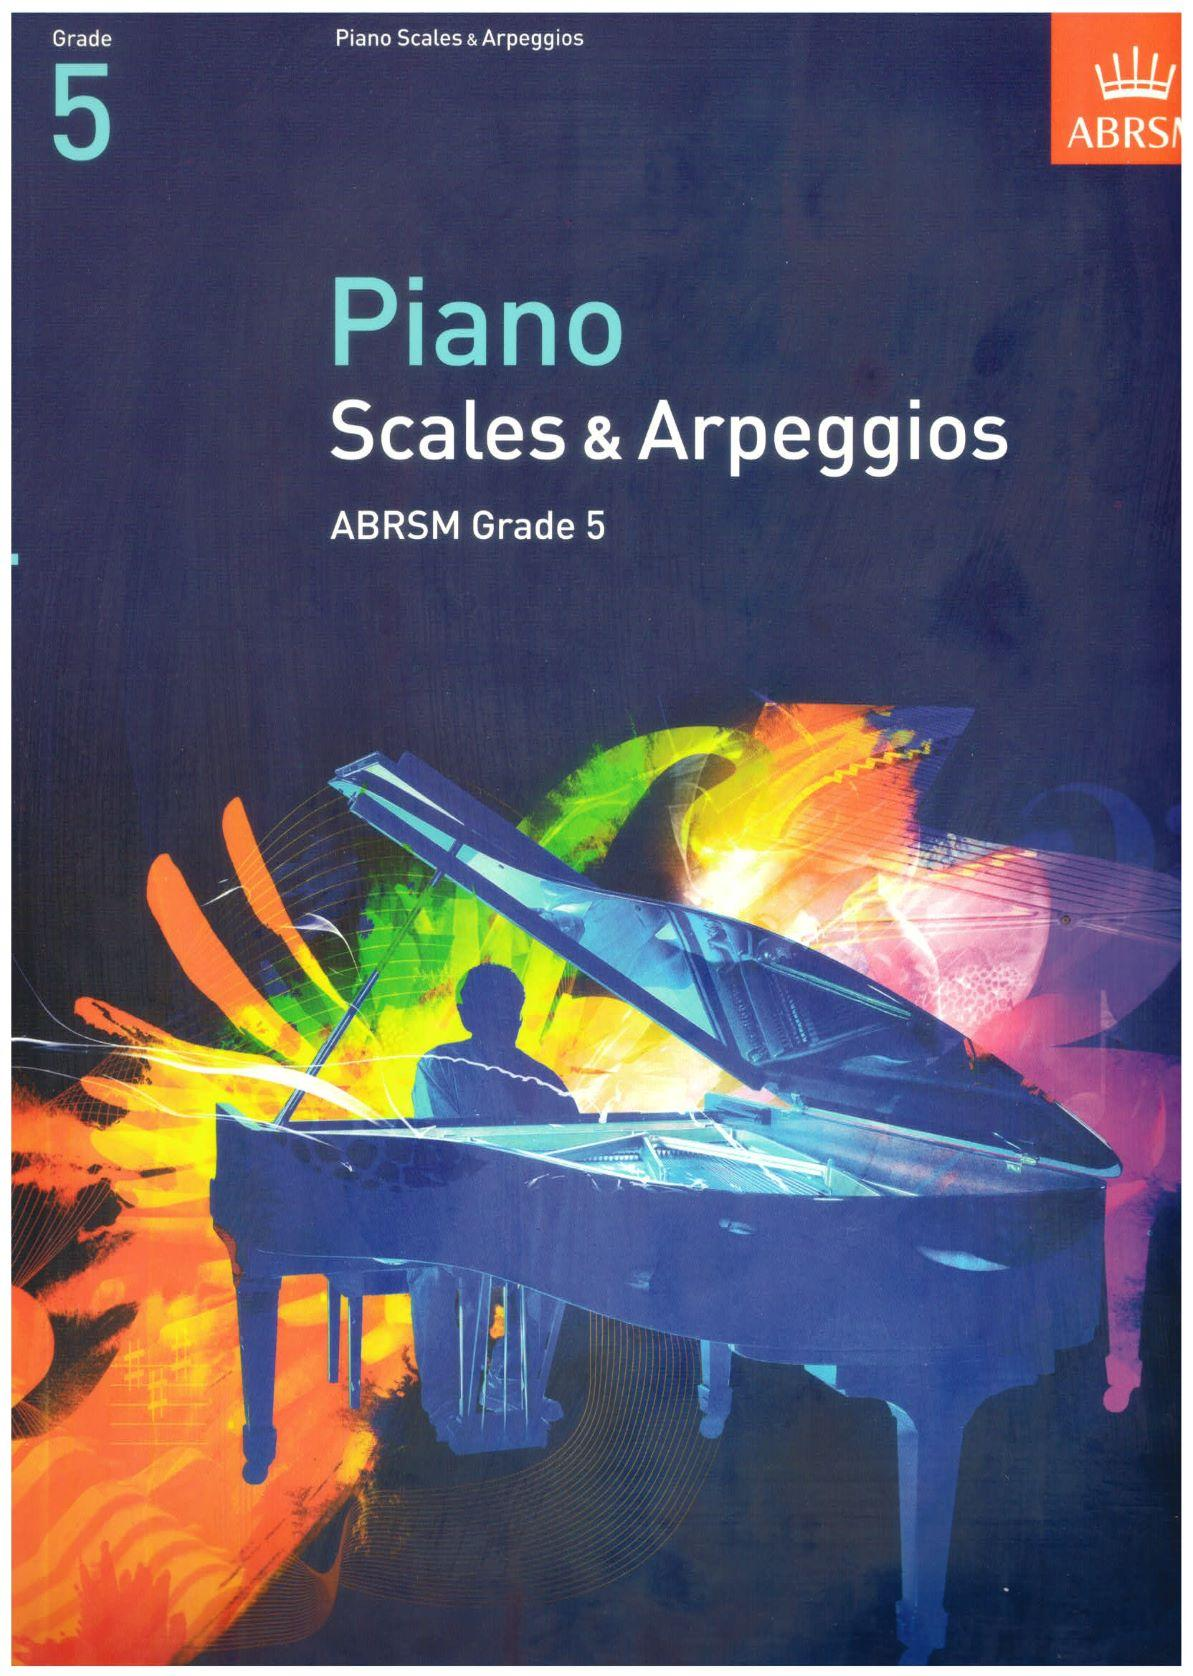 ABRSM Piano Scales & Arpeggios - Grade 5